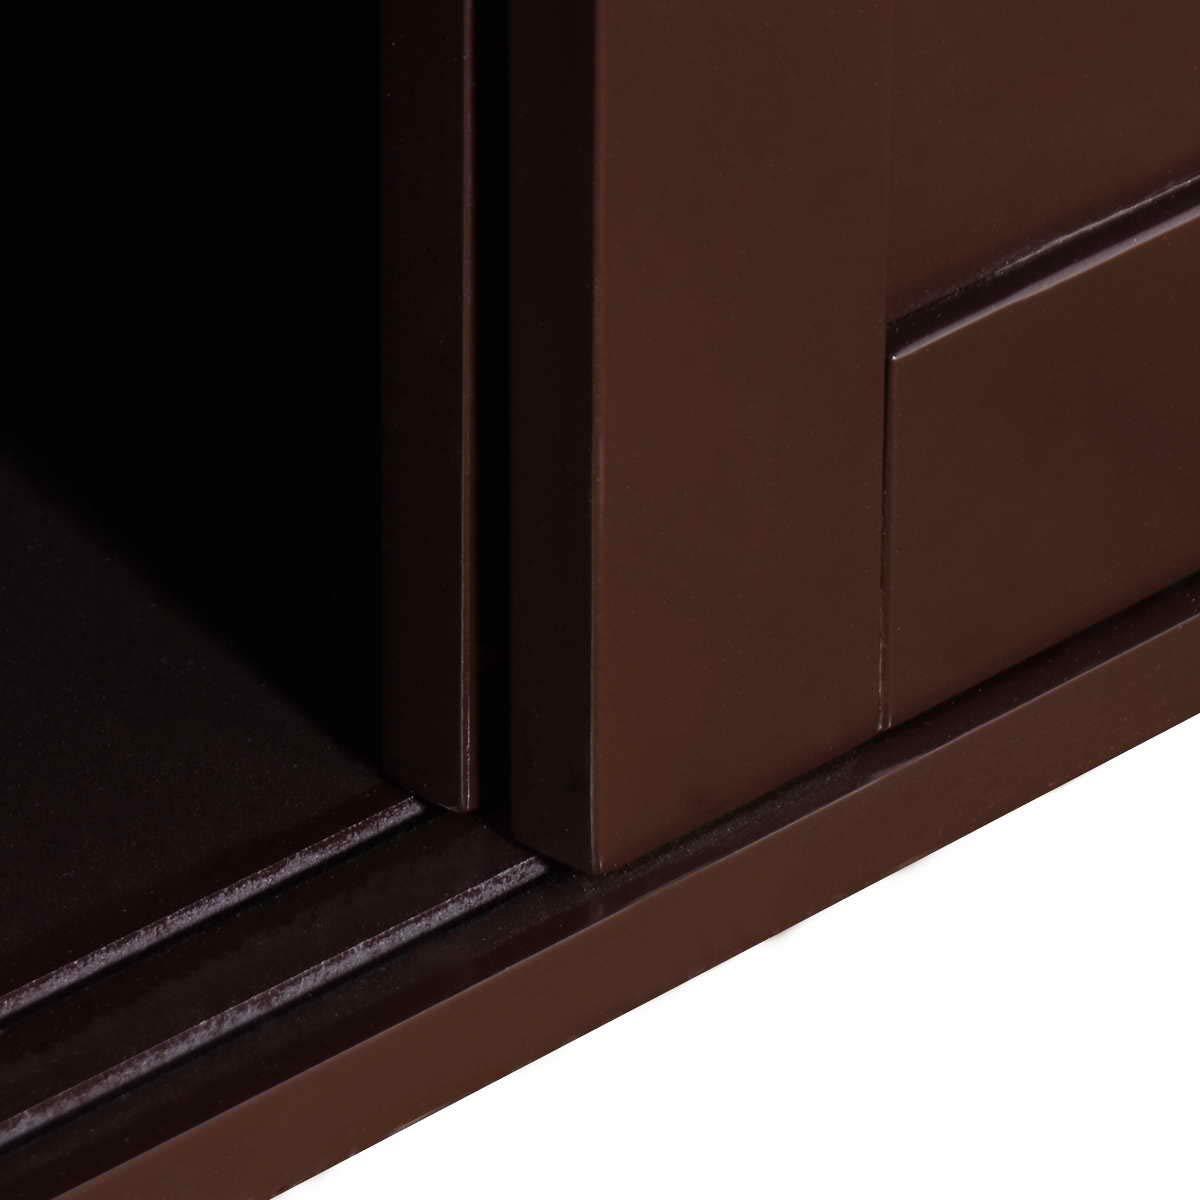 WATERJOY Kitchen Storage Sideboard, Stackable Buffet Storage Cabinet with Sliding Door Panels for Home Kitchen, Antique Brown by WATERJOY (Image #2)